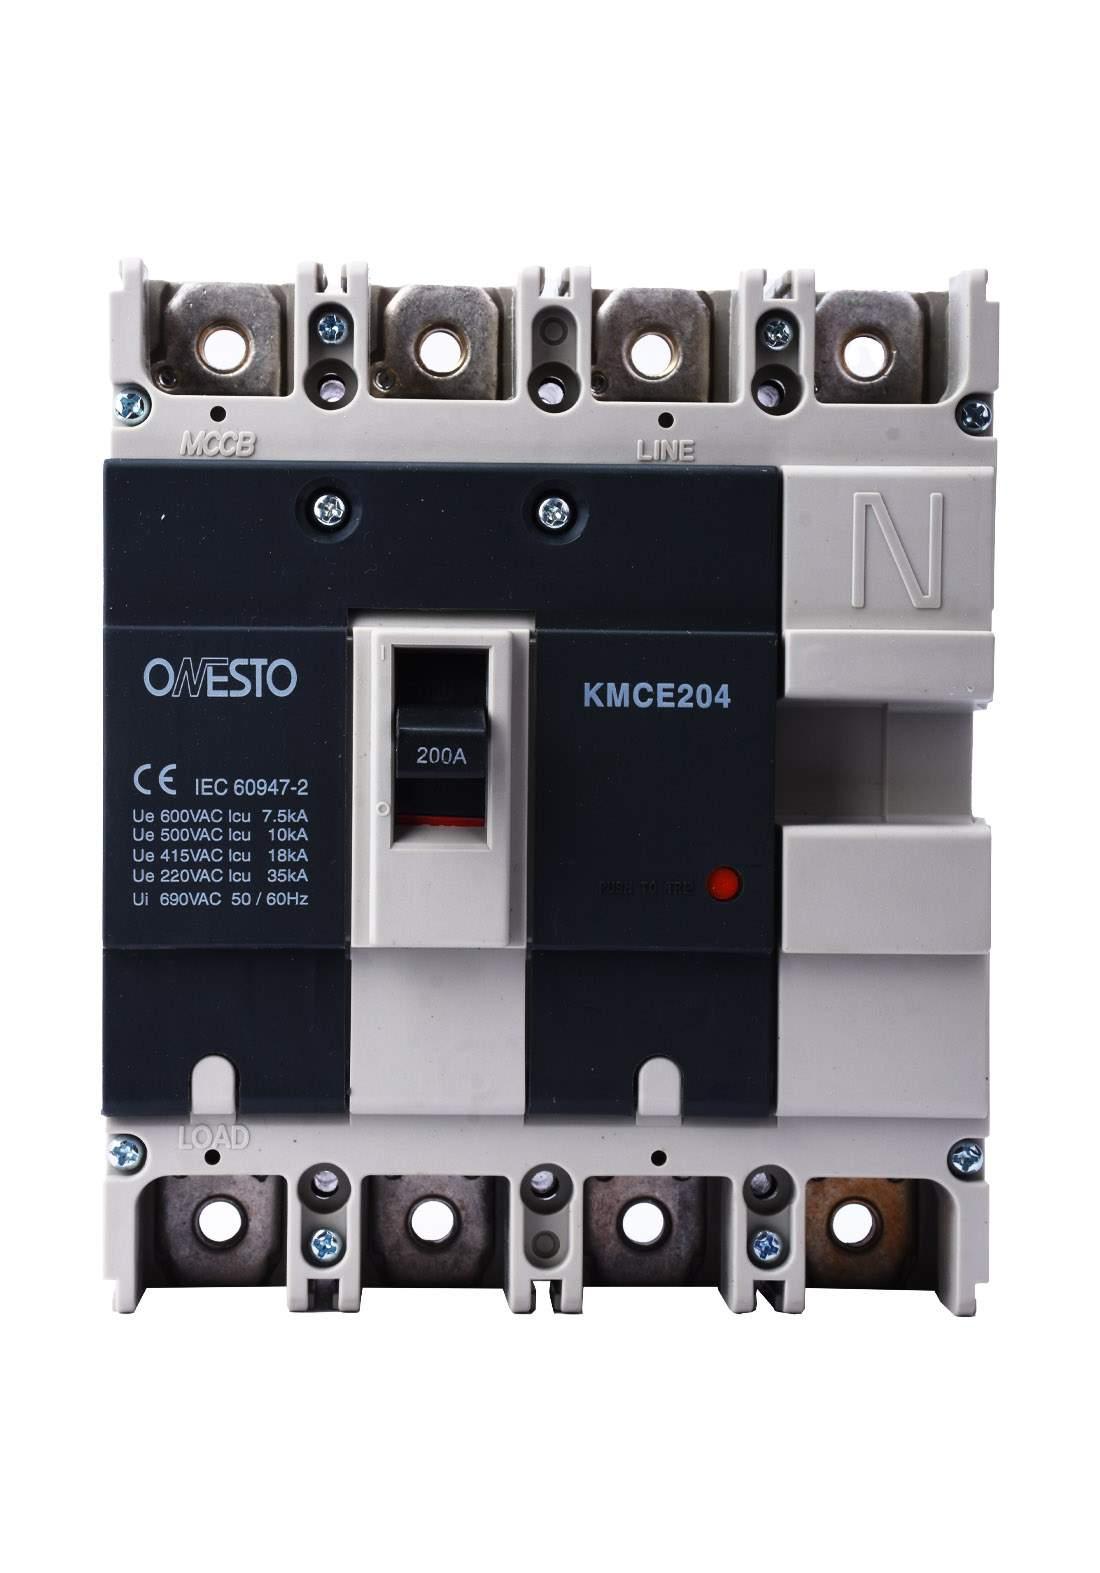 Onesto KMCE204 Circuit Breaker 200 A قاطع تيار الكهرباء هوائي (جوزة)